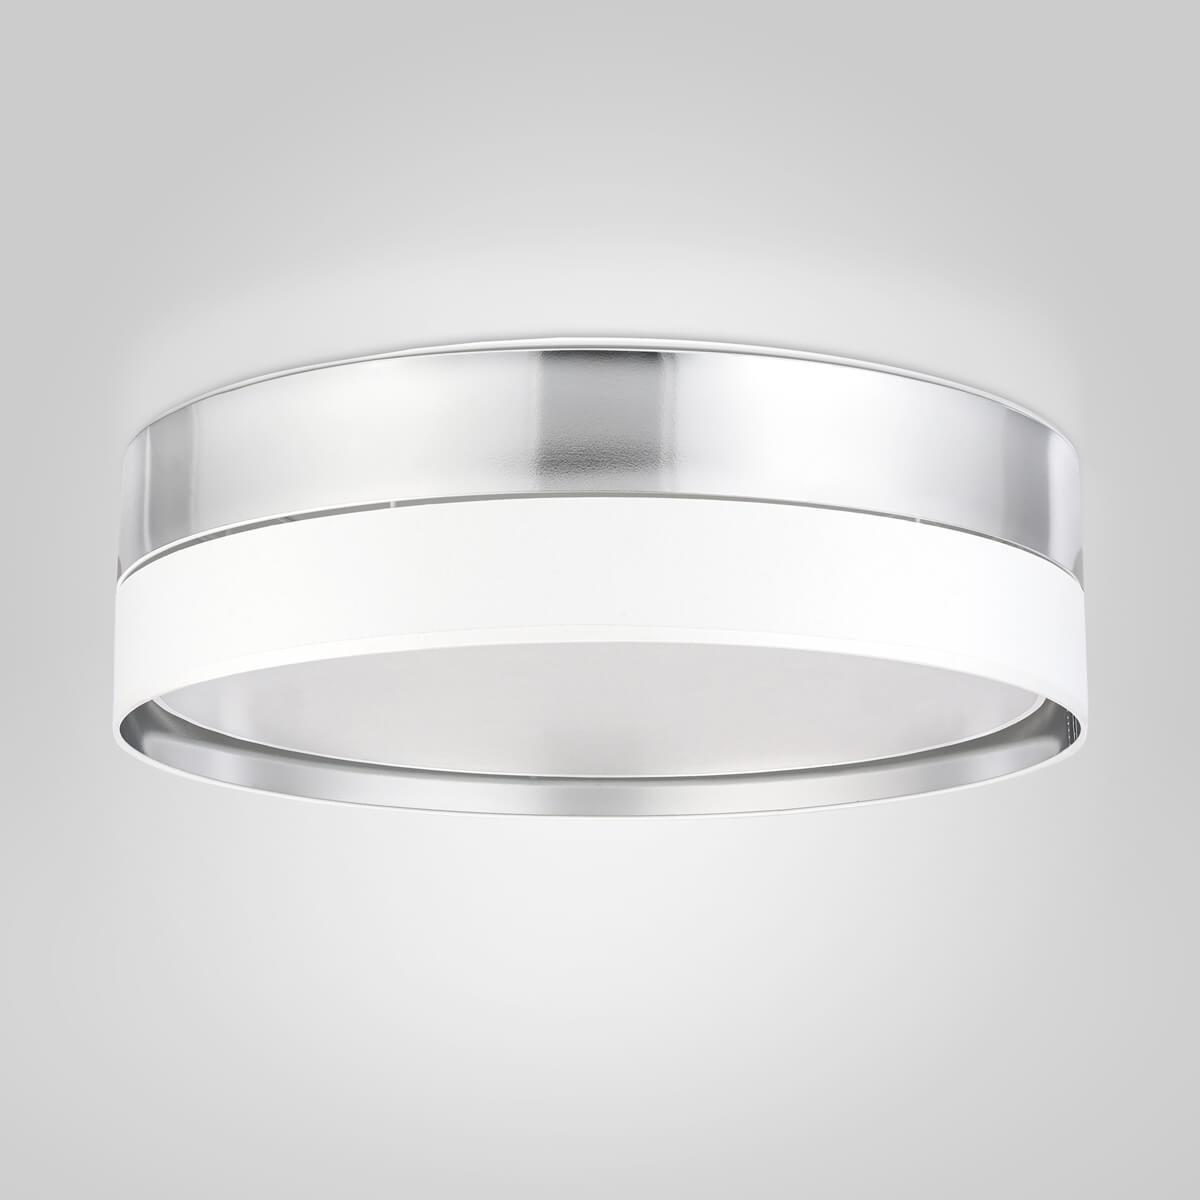 Светильник TK Lighting 4179 Hilton Silver Hilton Silver